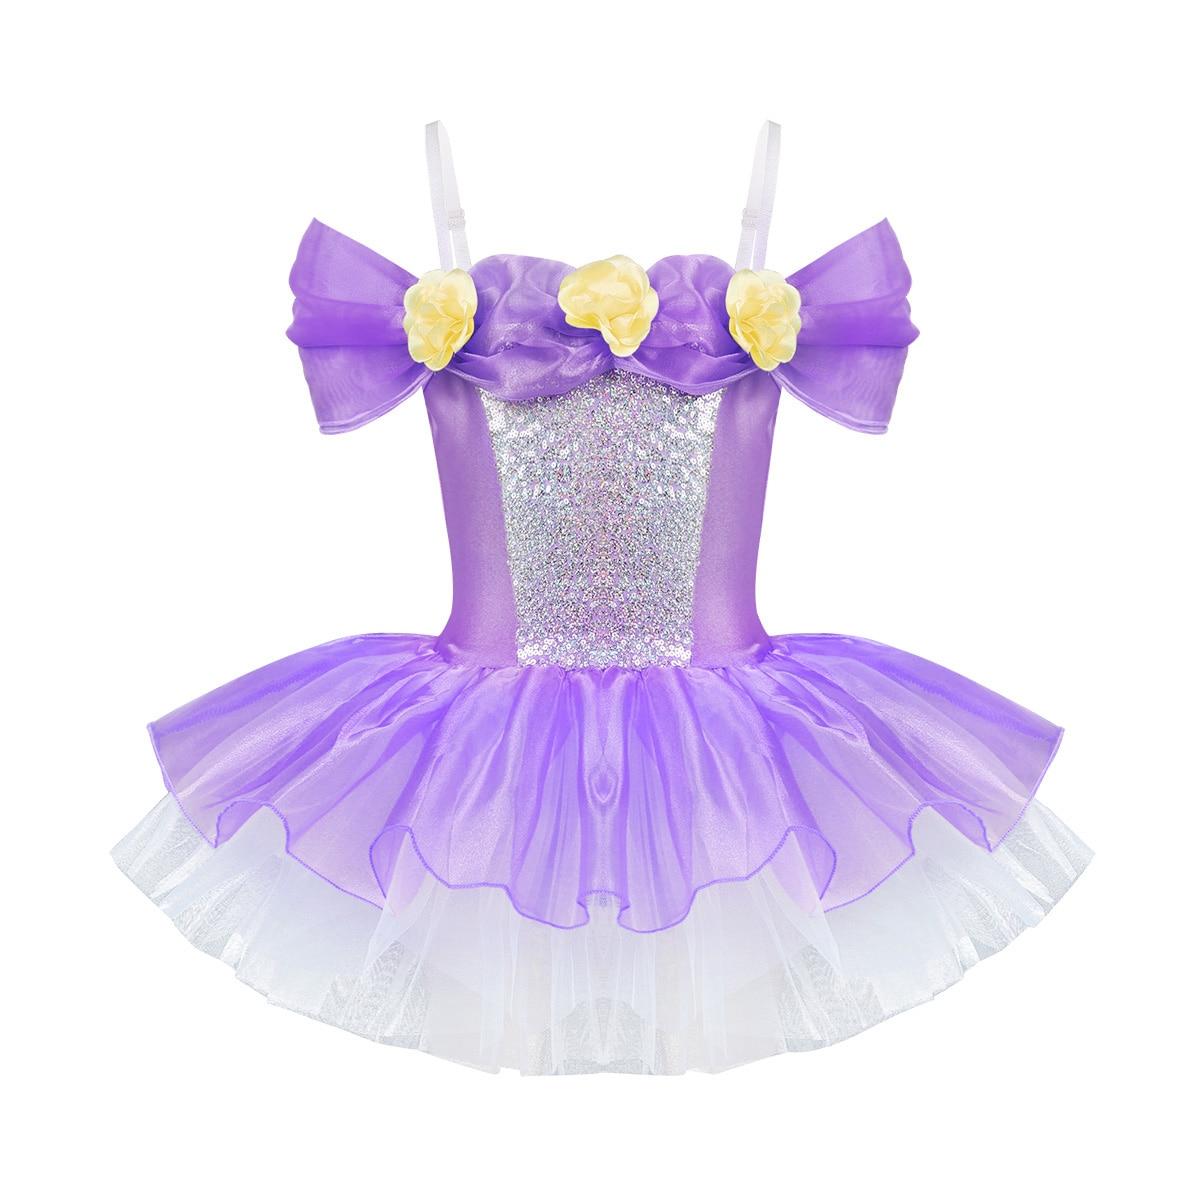 UK Girls Flower Ballet Dance Tutu Dress Gymnastics Leotards Skirt Show Costumes